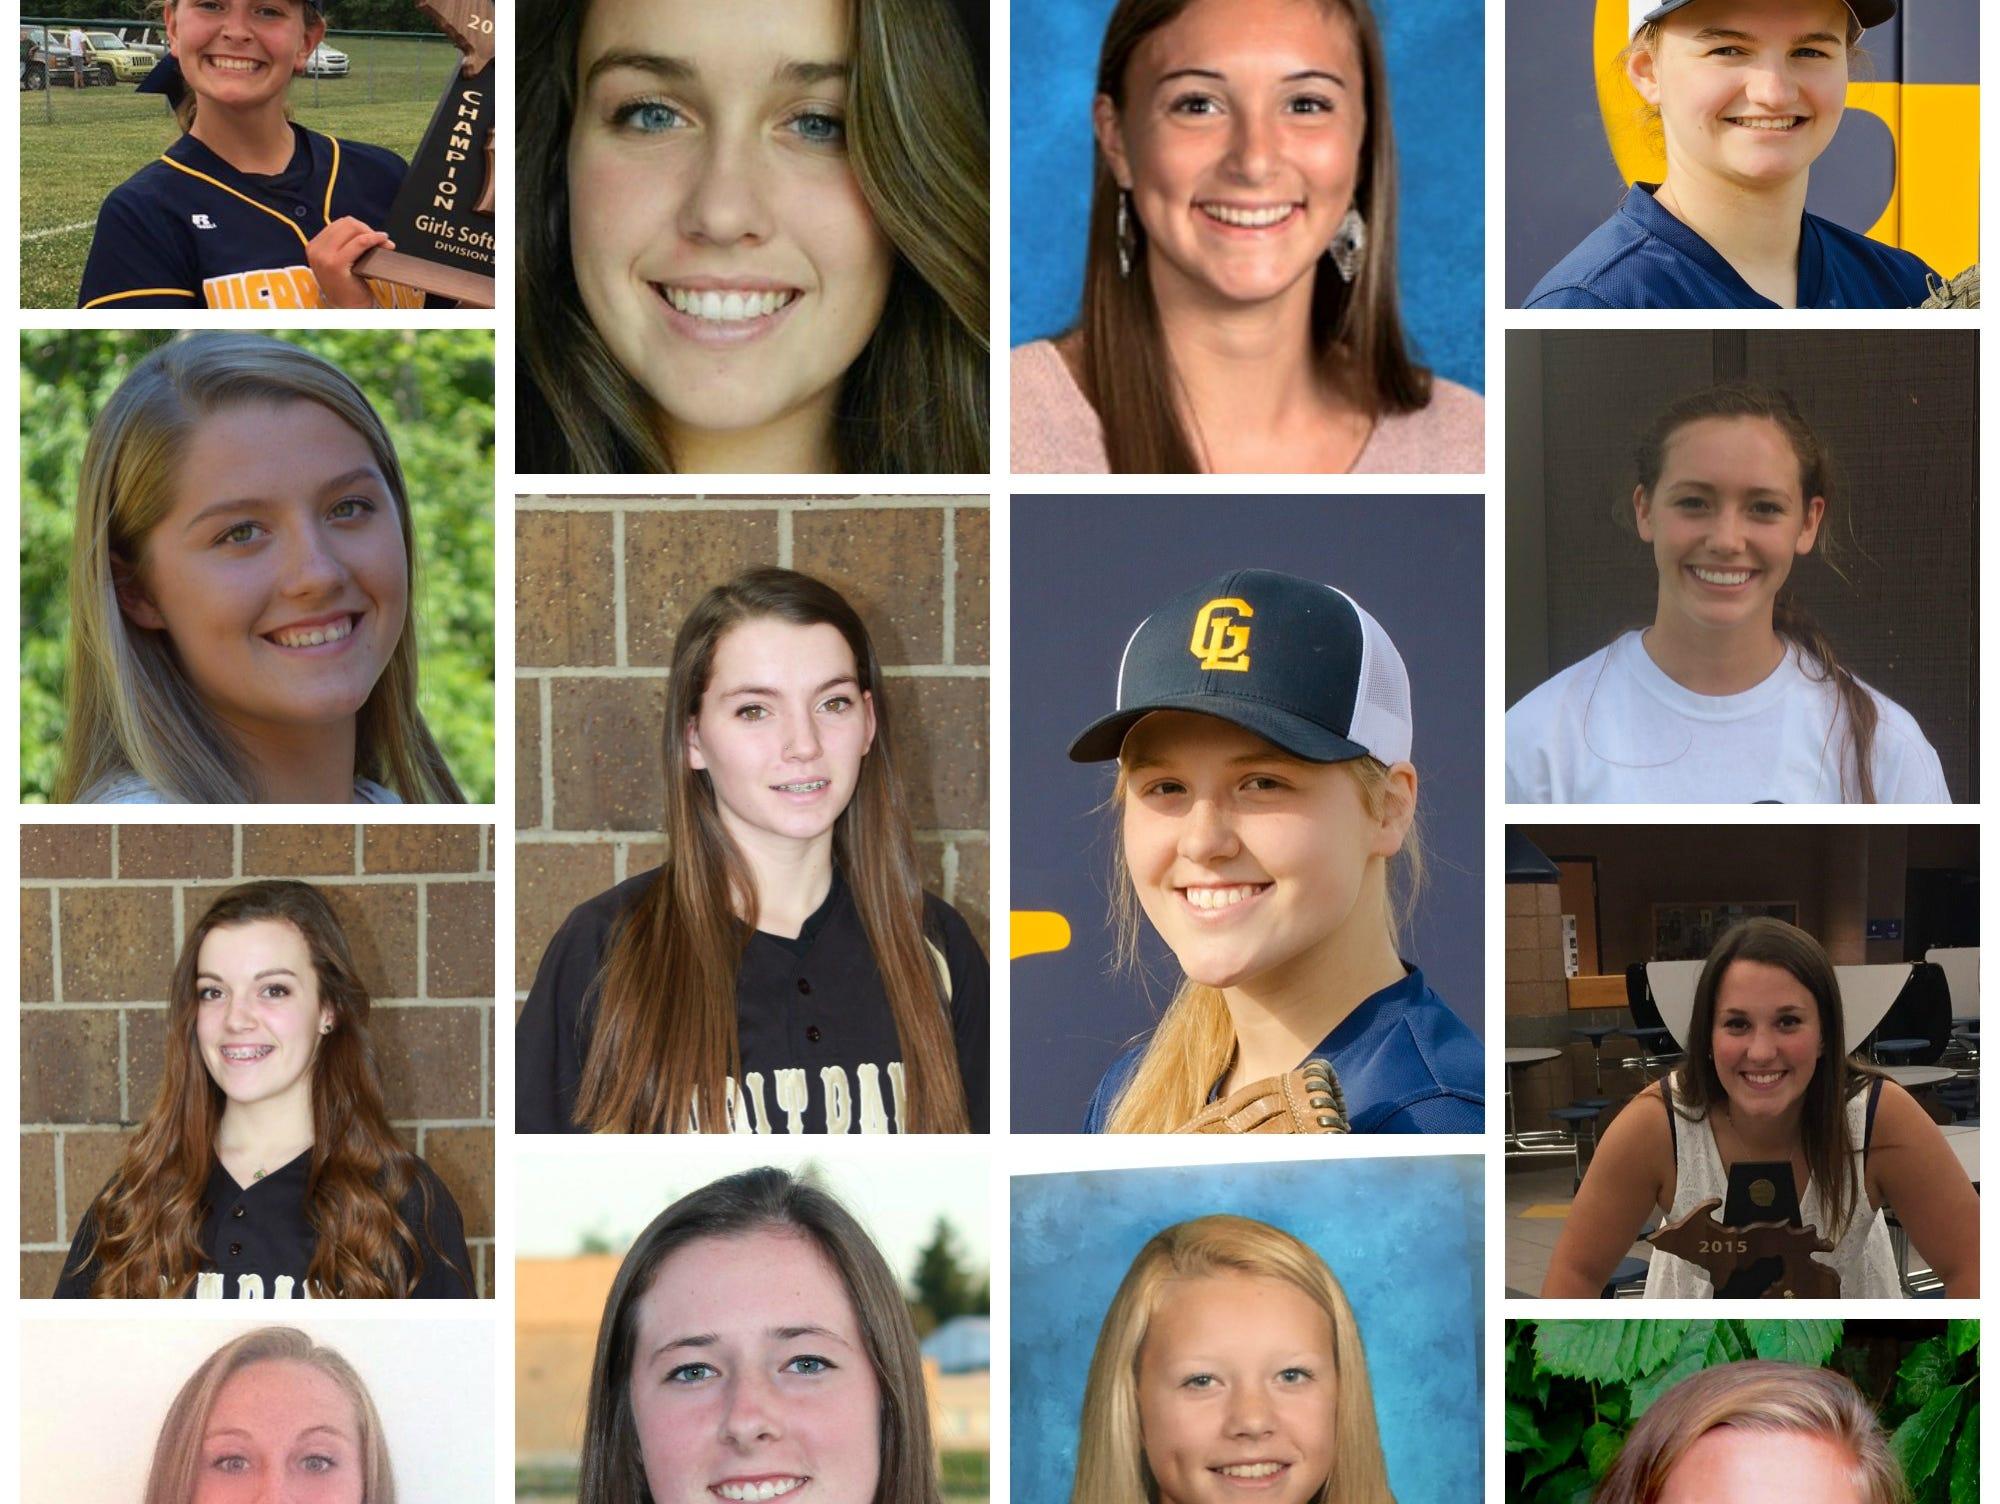 Meet the Lansing State Journal 2016 Softball Dream Team.